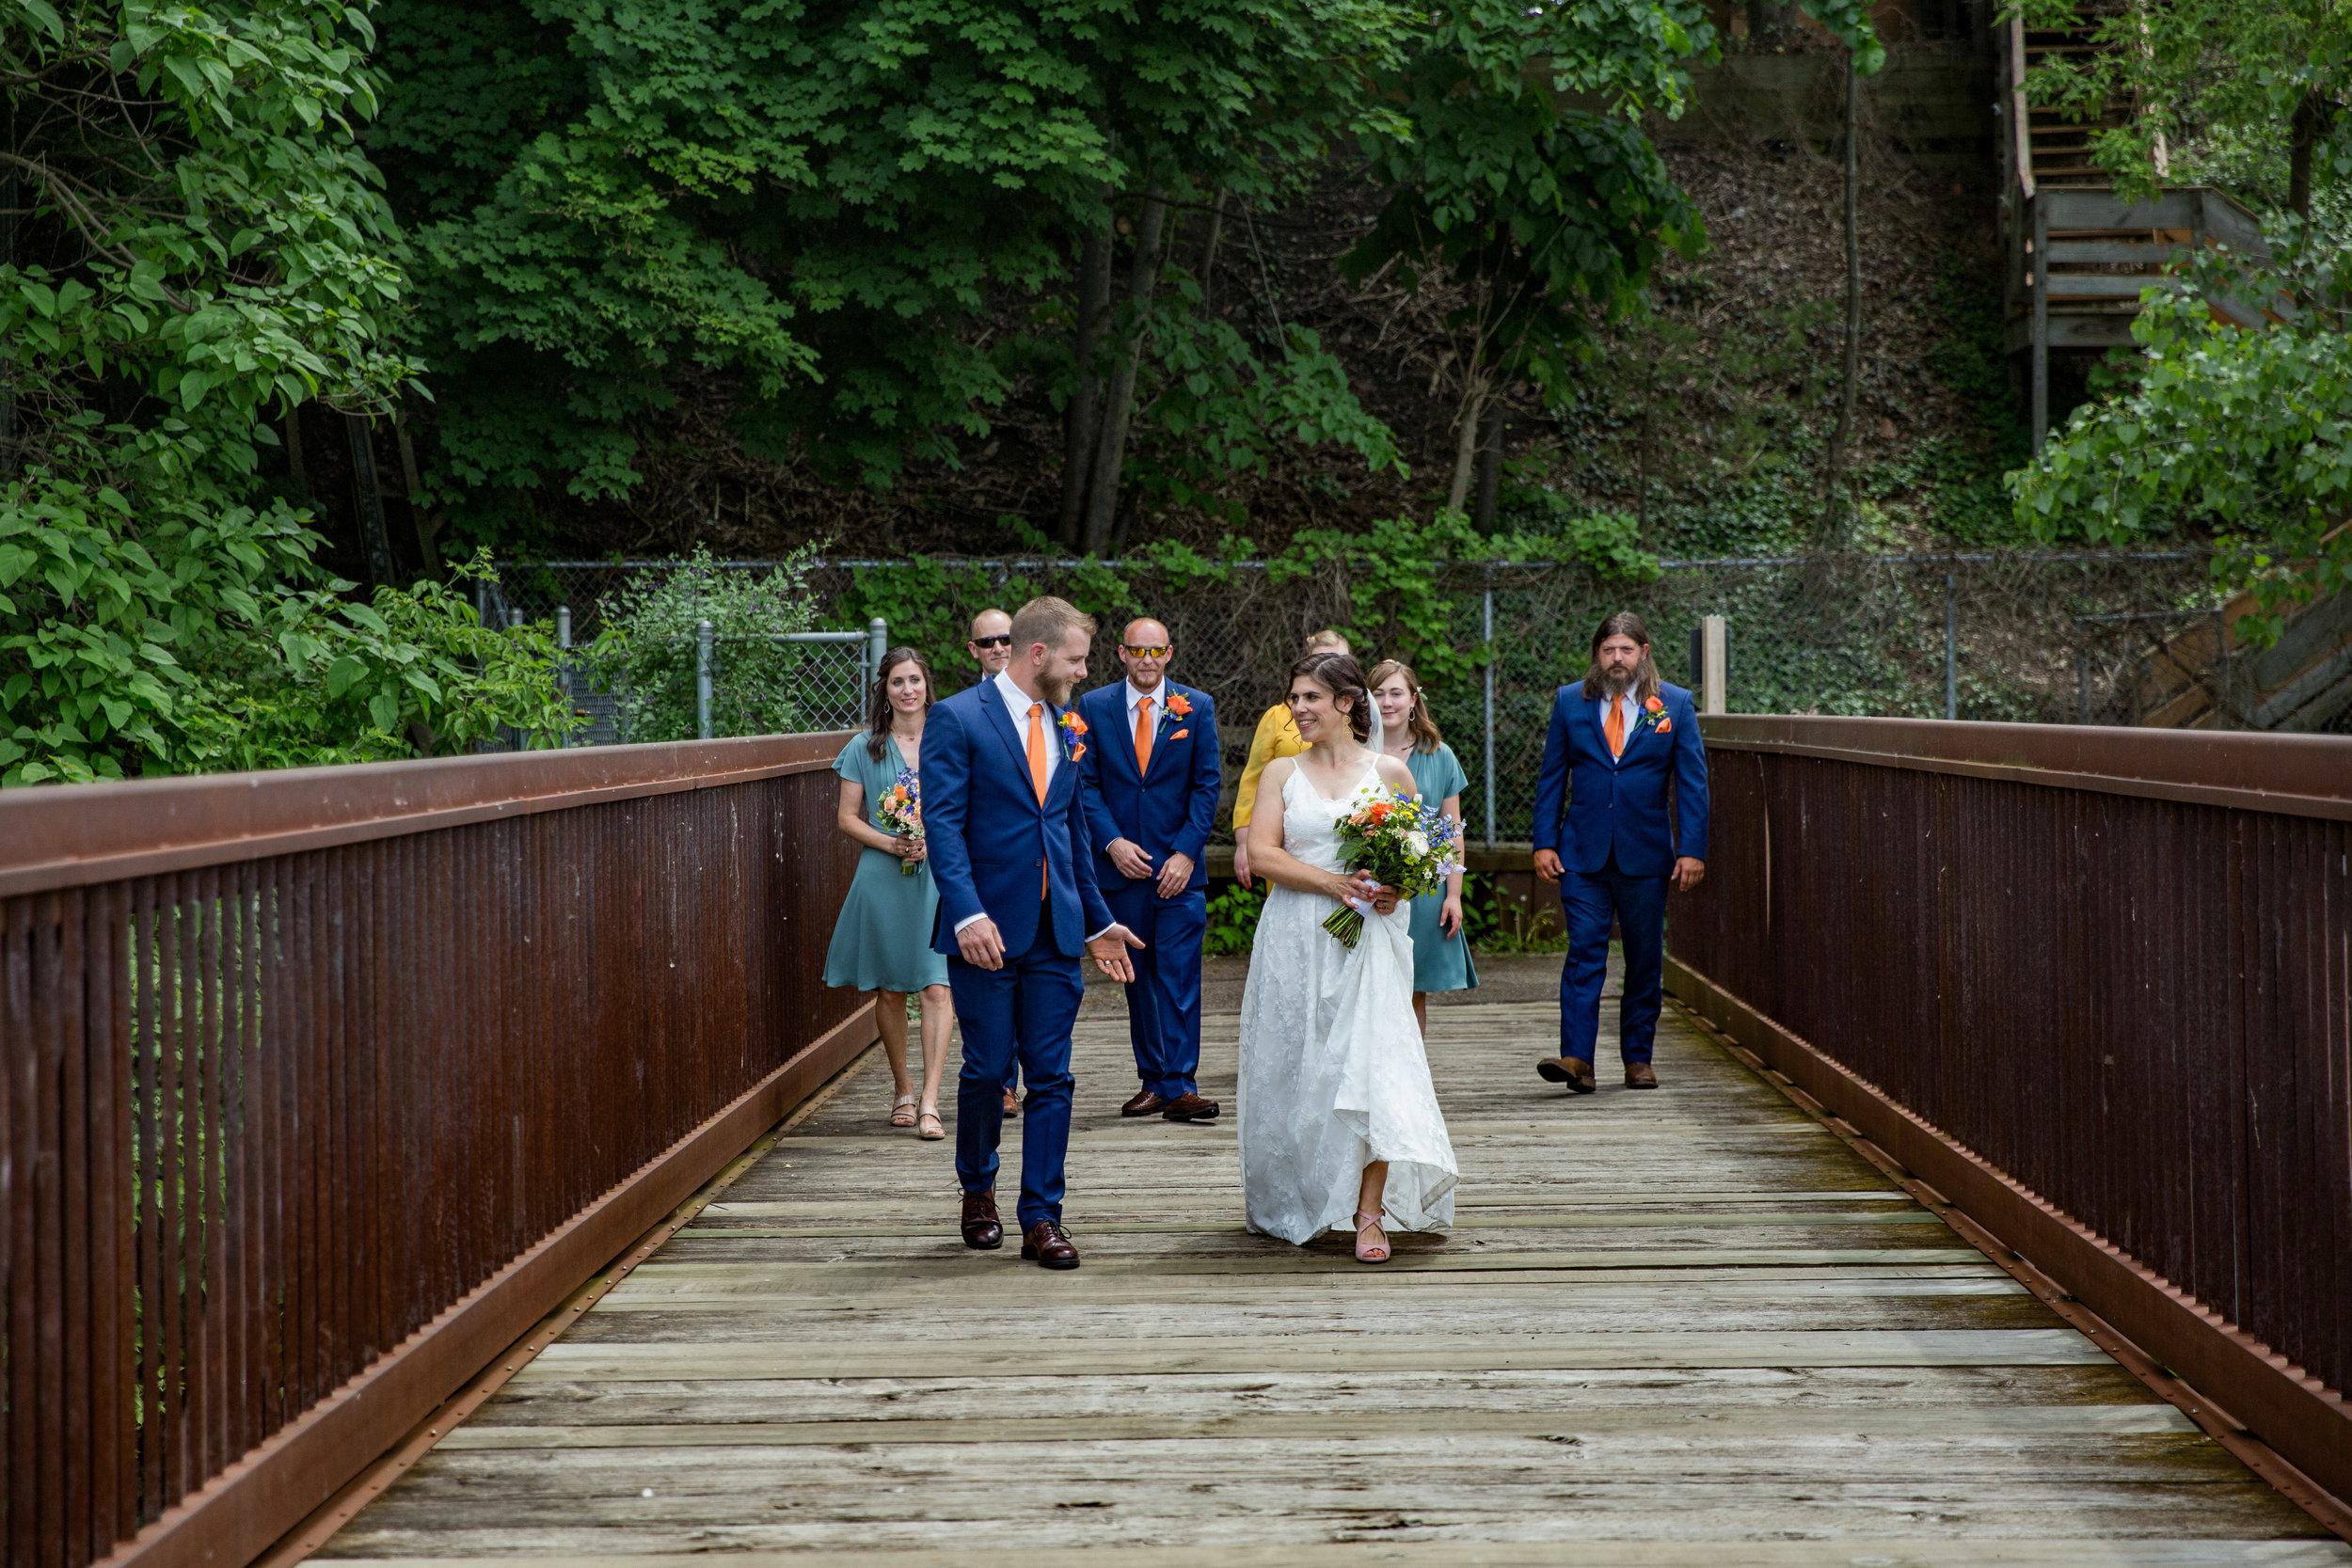 Natalie and Dallas Mooney Wedding 6-8-19_Tania Watt Photography-242.jpg